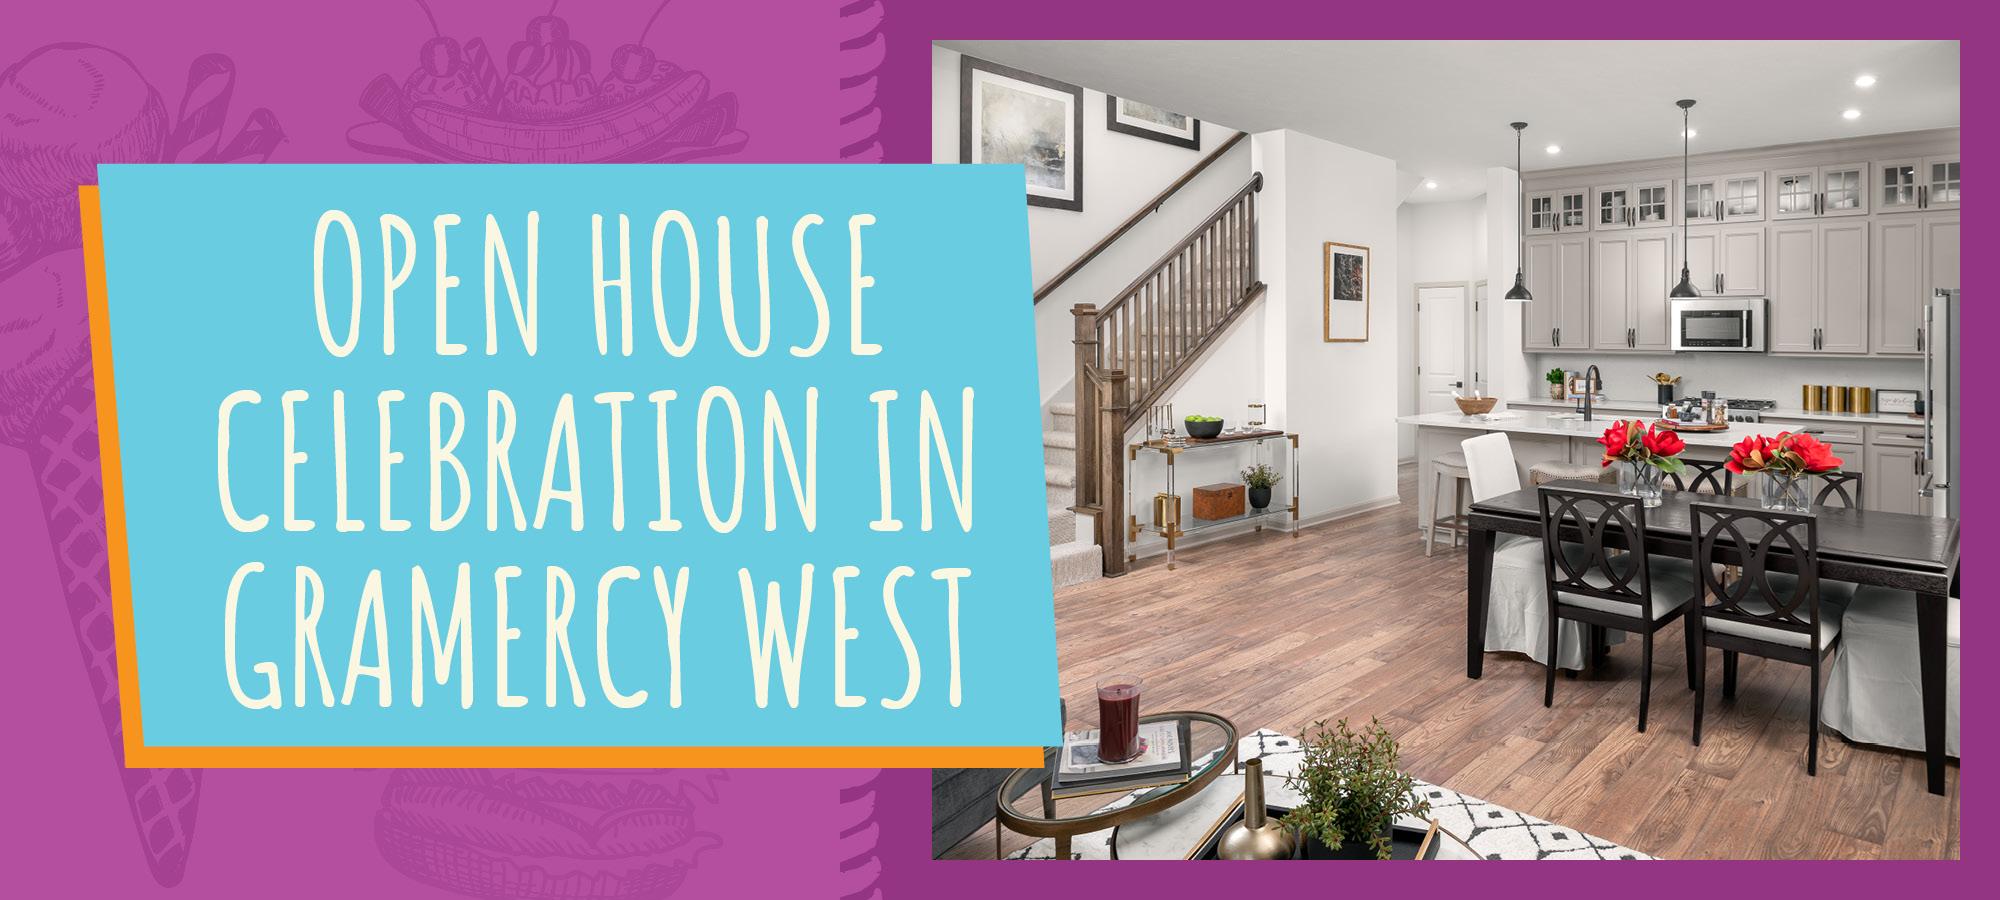 Open House Celebration in Gramercy West